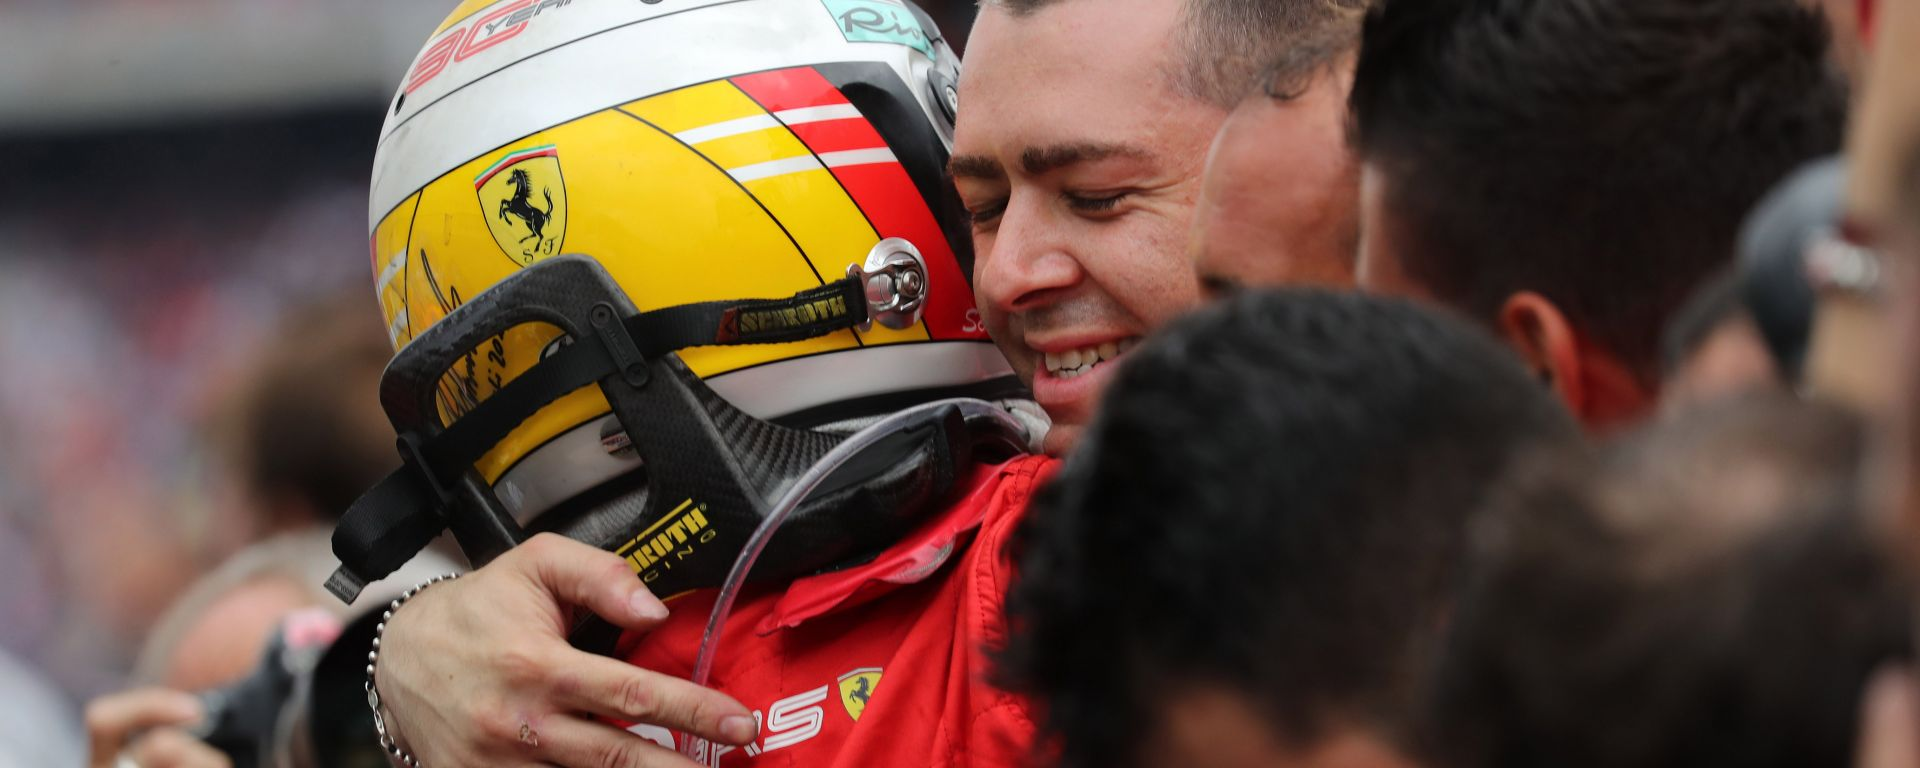 F1 GP Germania 2019, Sebastian Vettel (Ferrari) abbraccia i meccanici dopo il traguardo